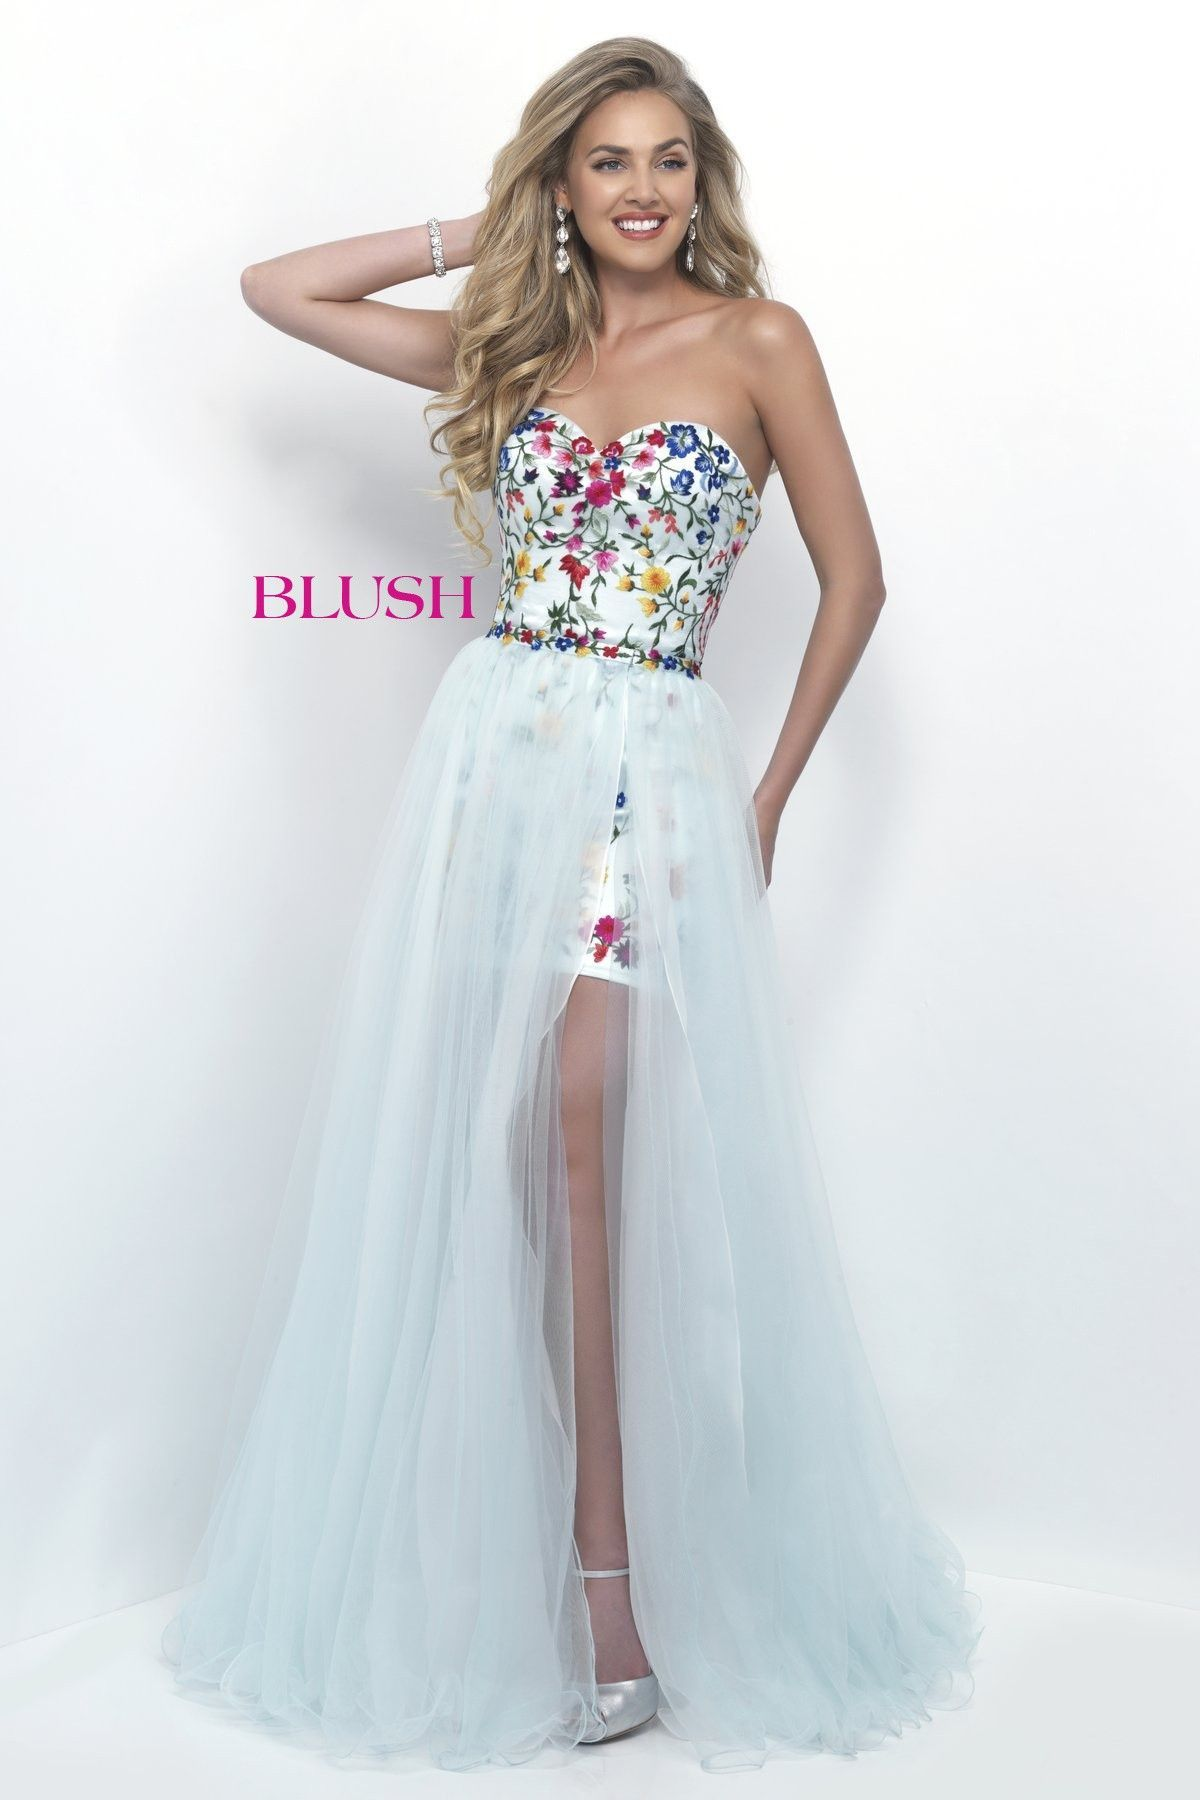 Blush Prom 11282 Mint Floral Sweetheart Prom Dress | Dresses ...